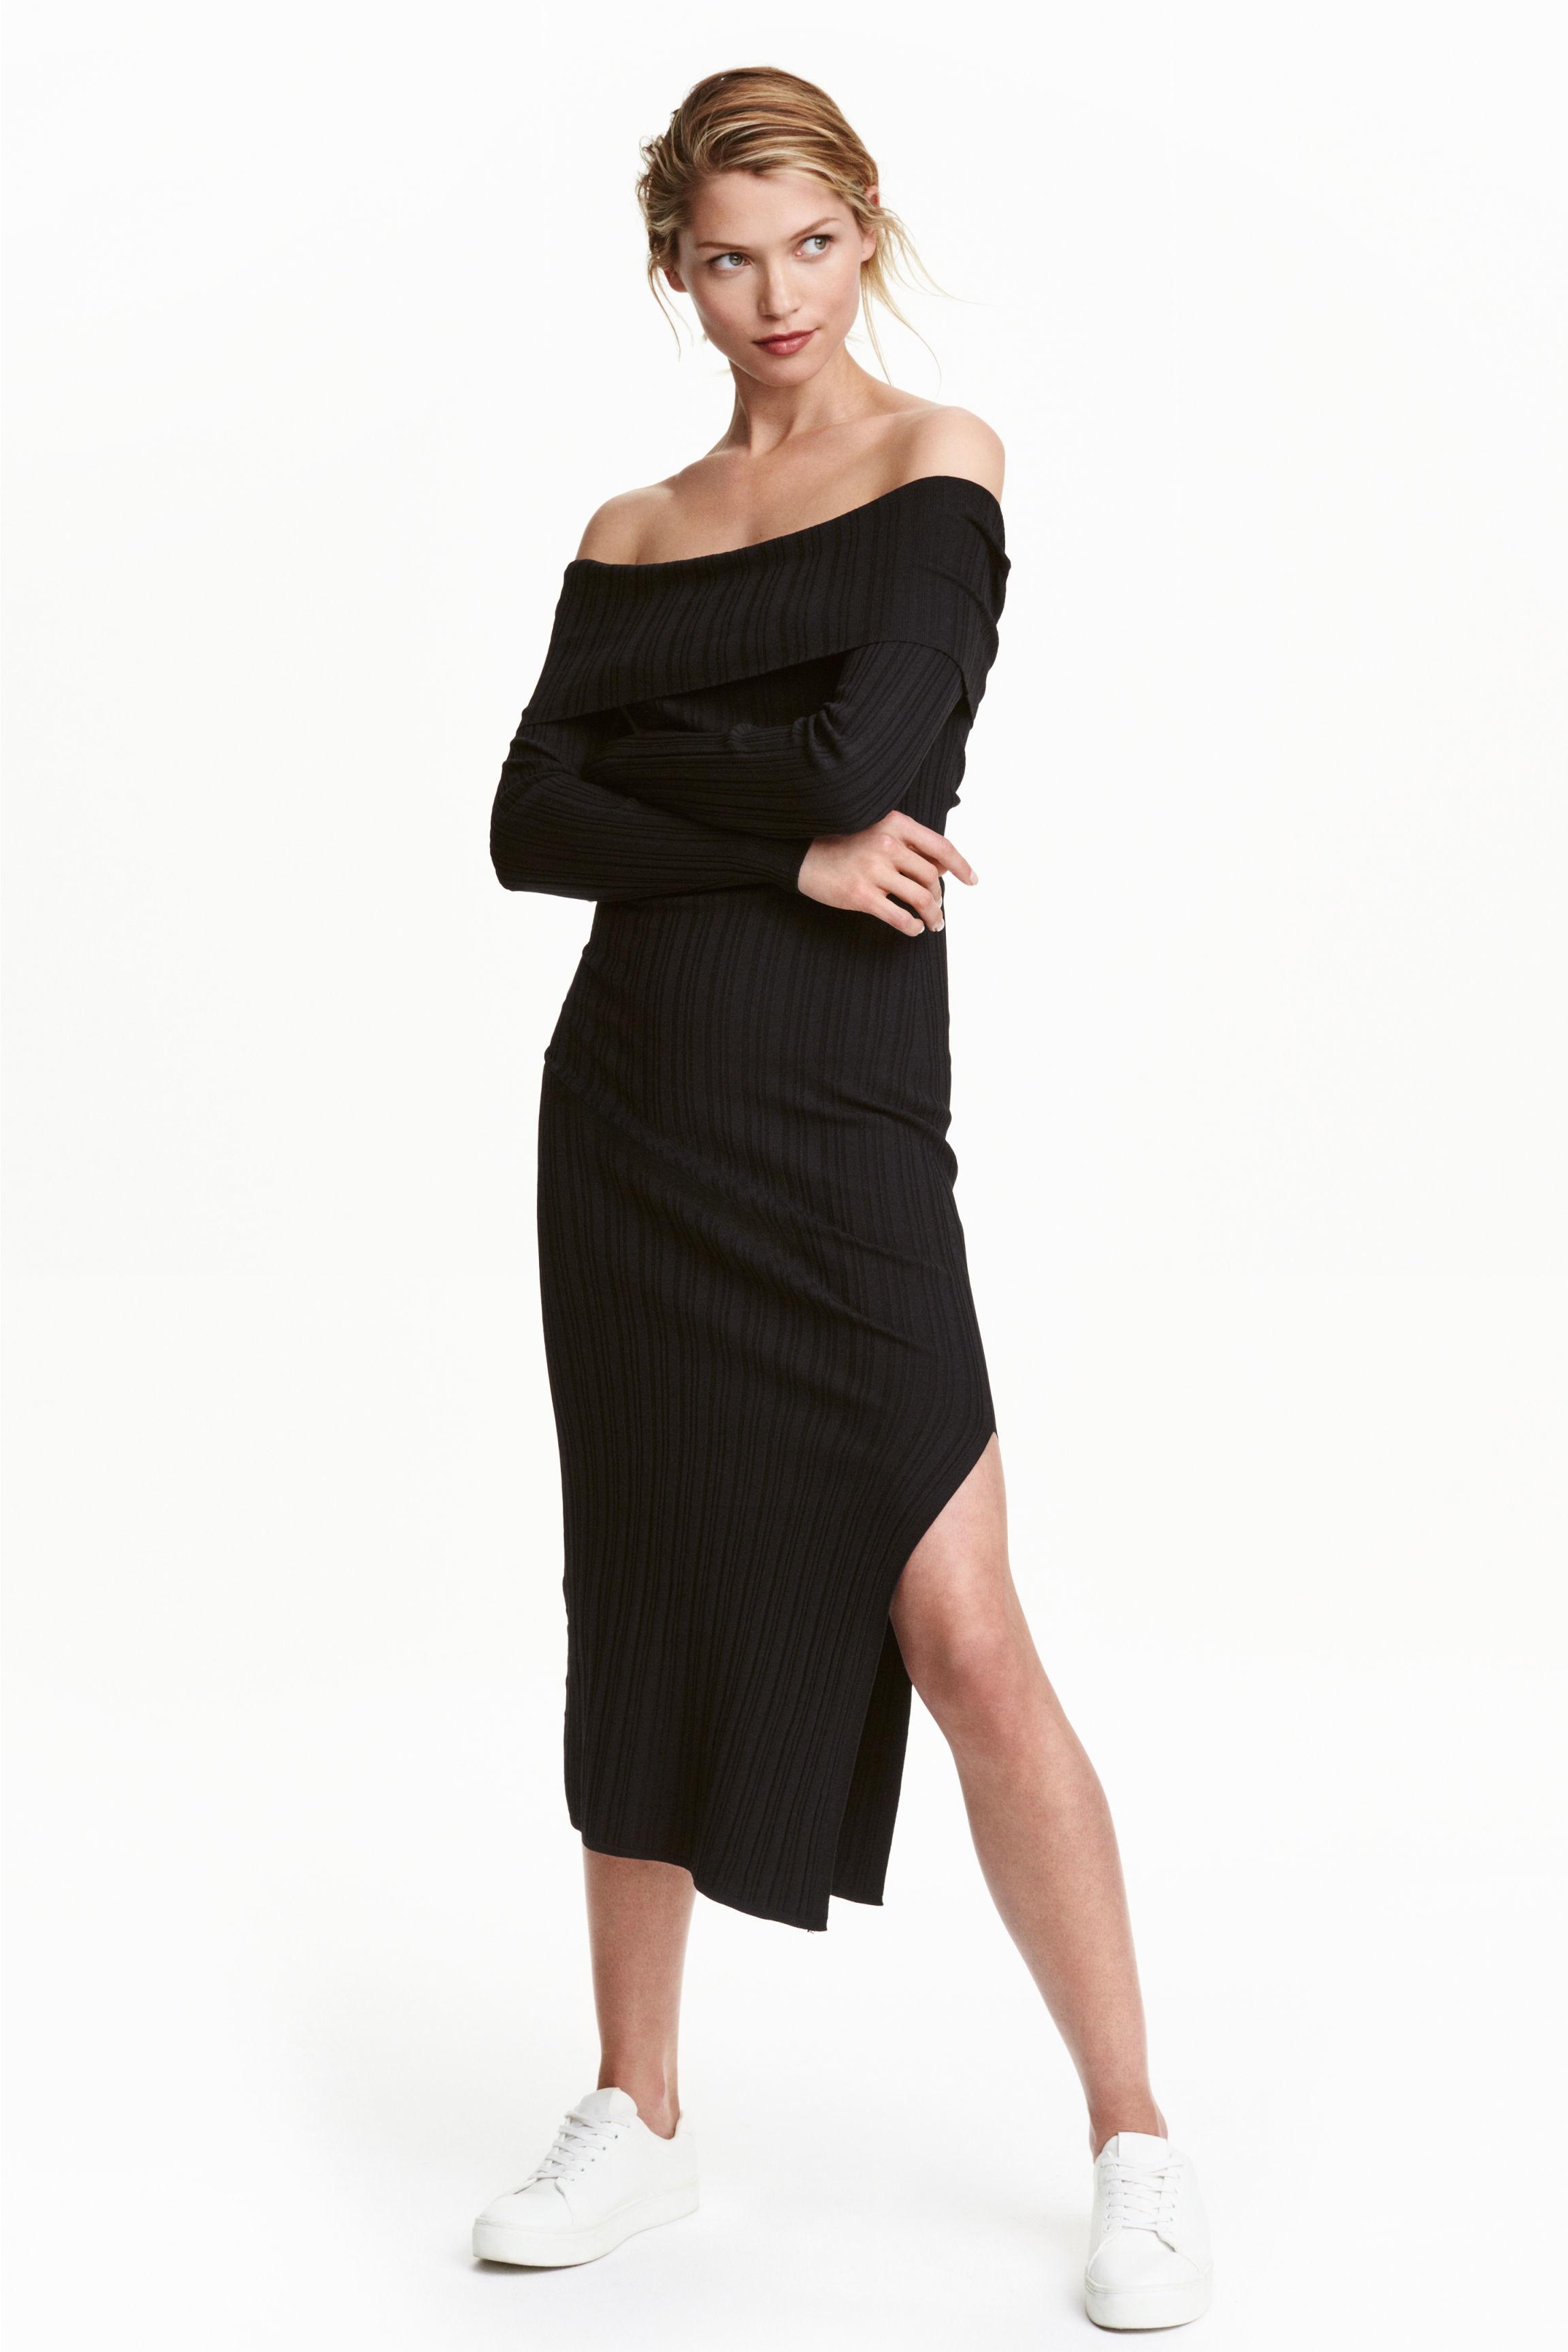 Hm black dress